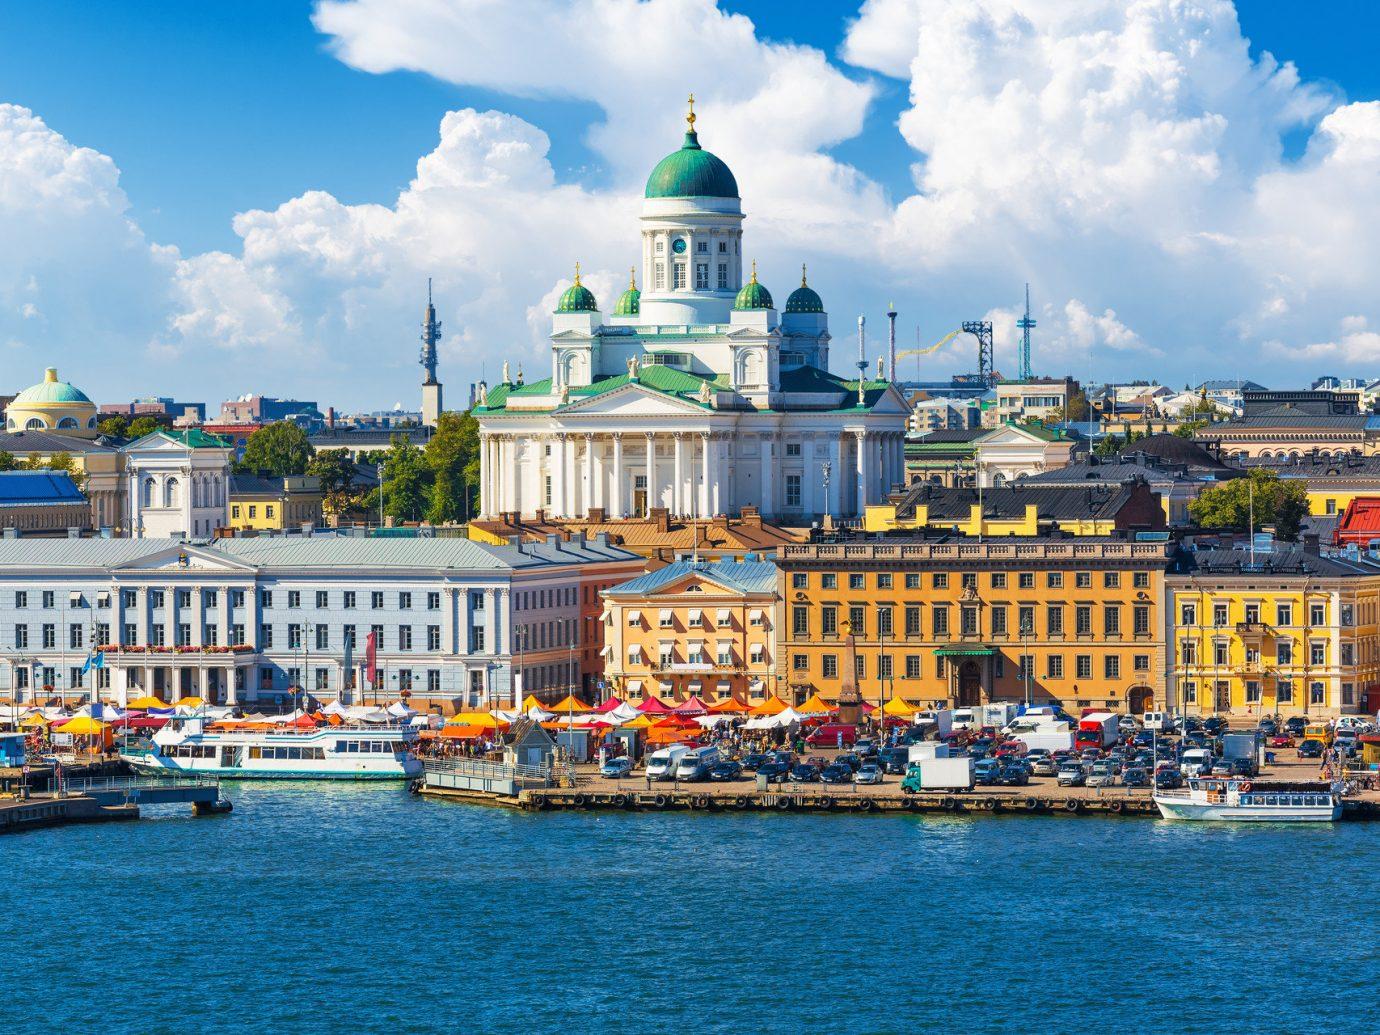 Skyline of Helsinki Finland